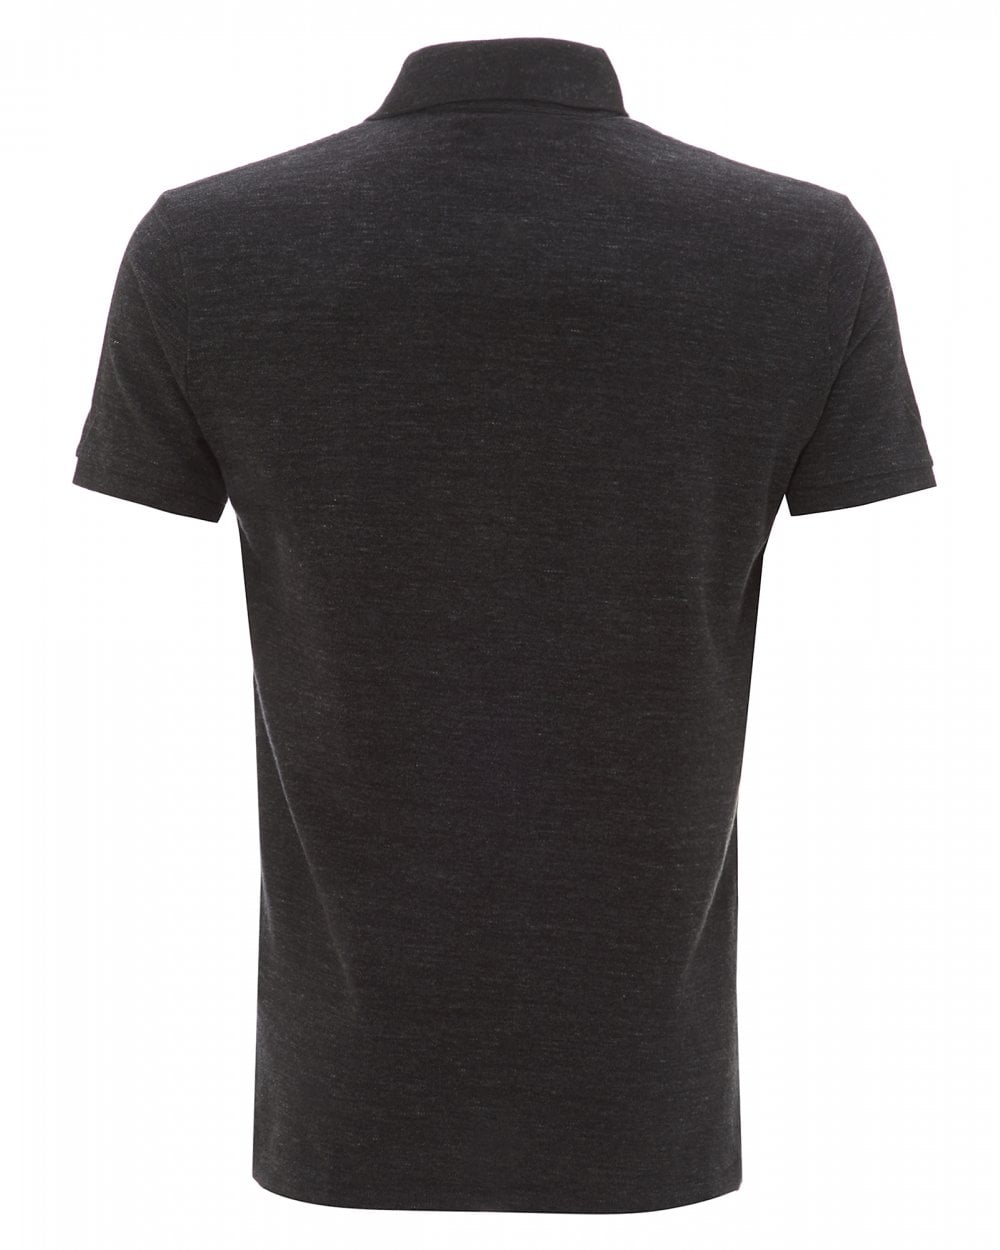 Mens Black Marl Heather Chest Logo Polo Shirt